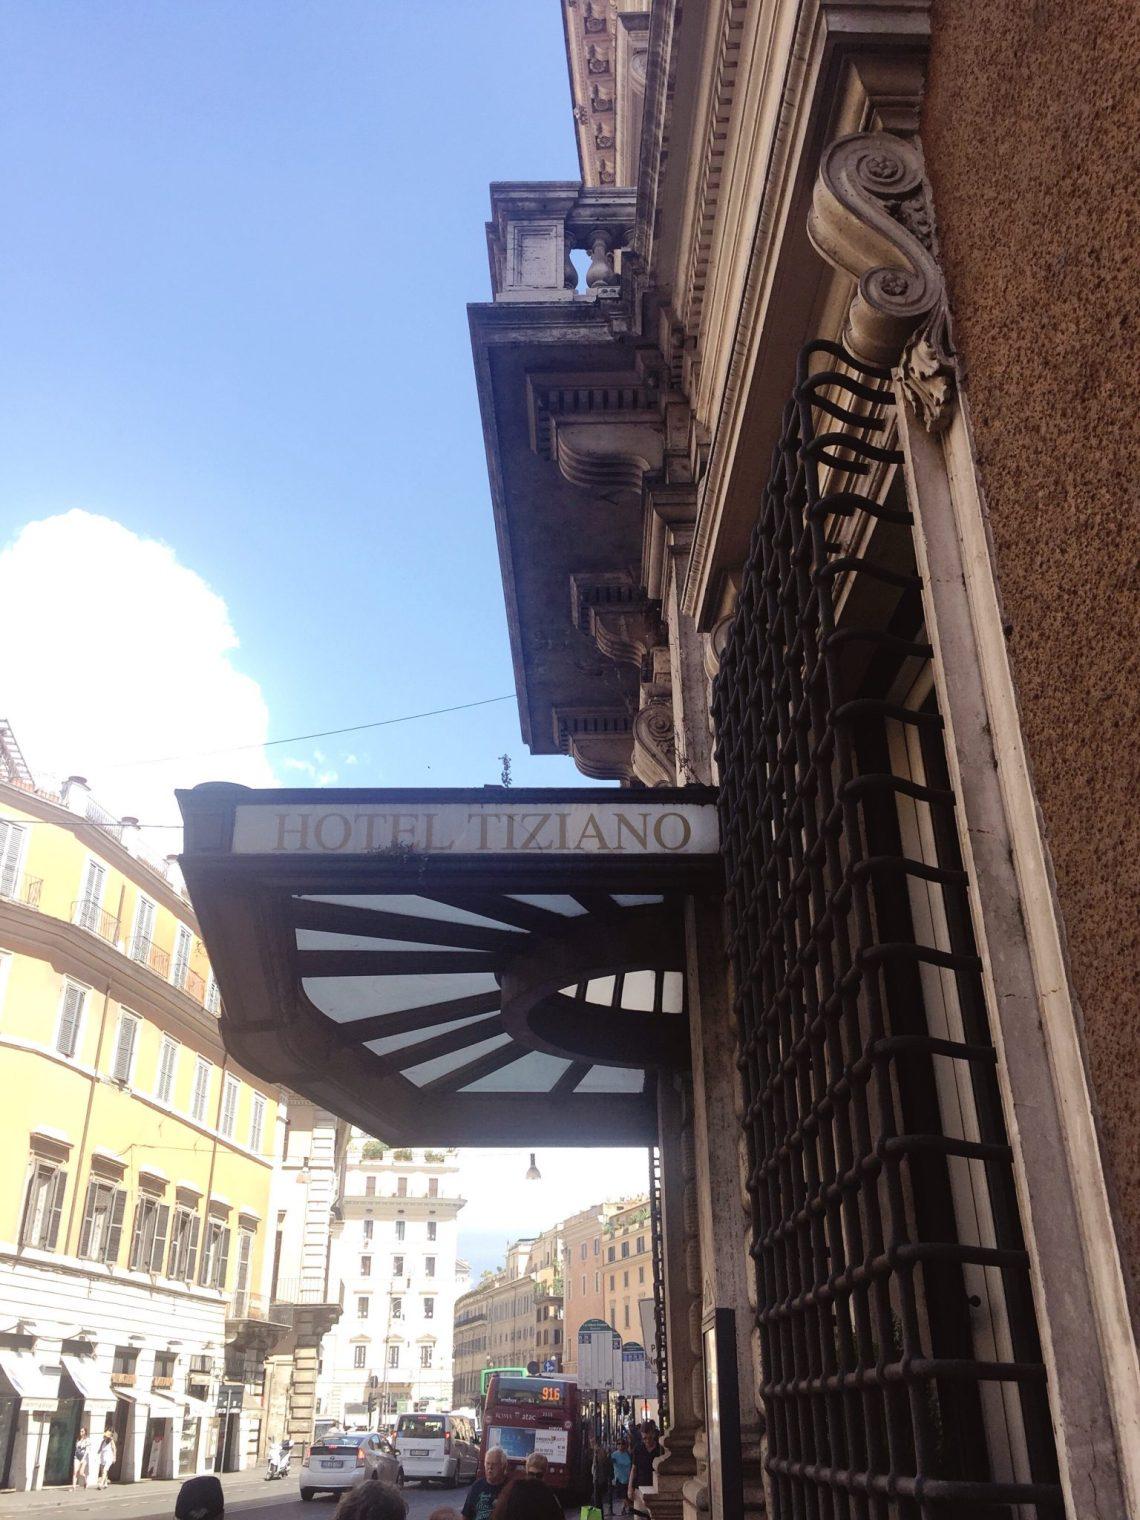 Hotel Tiziano in Rome Italy